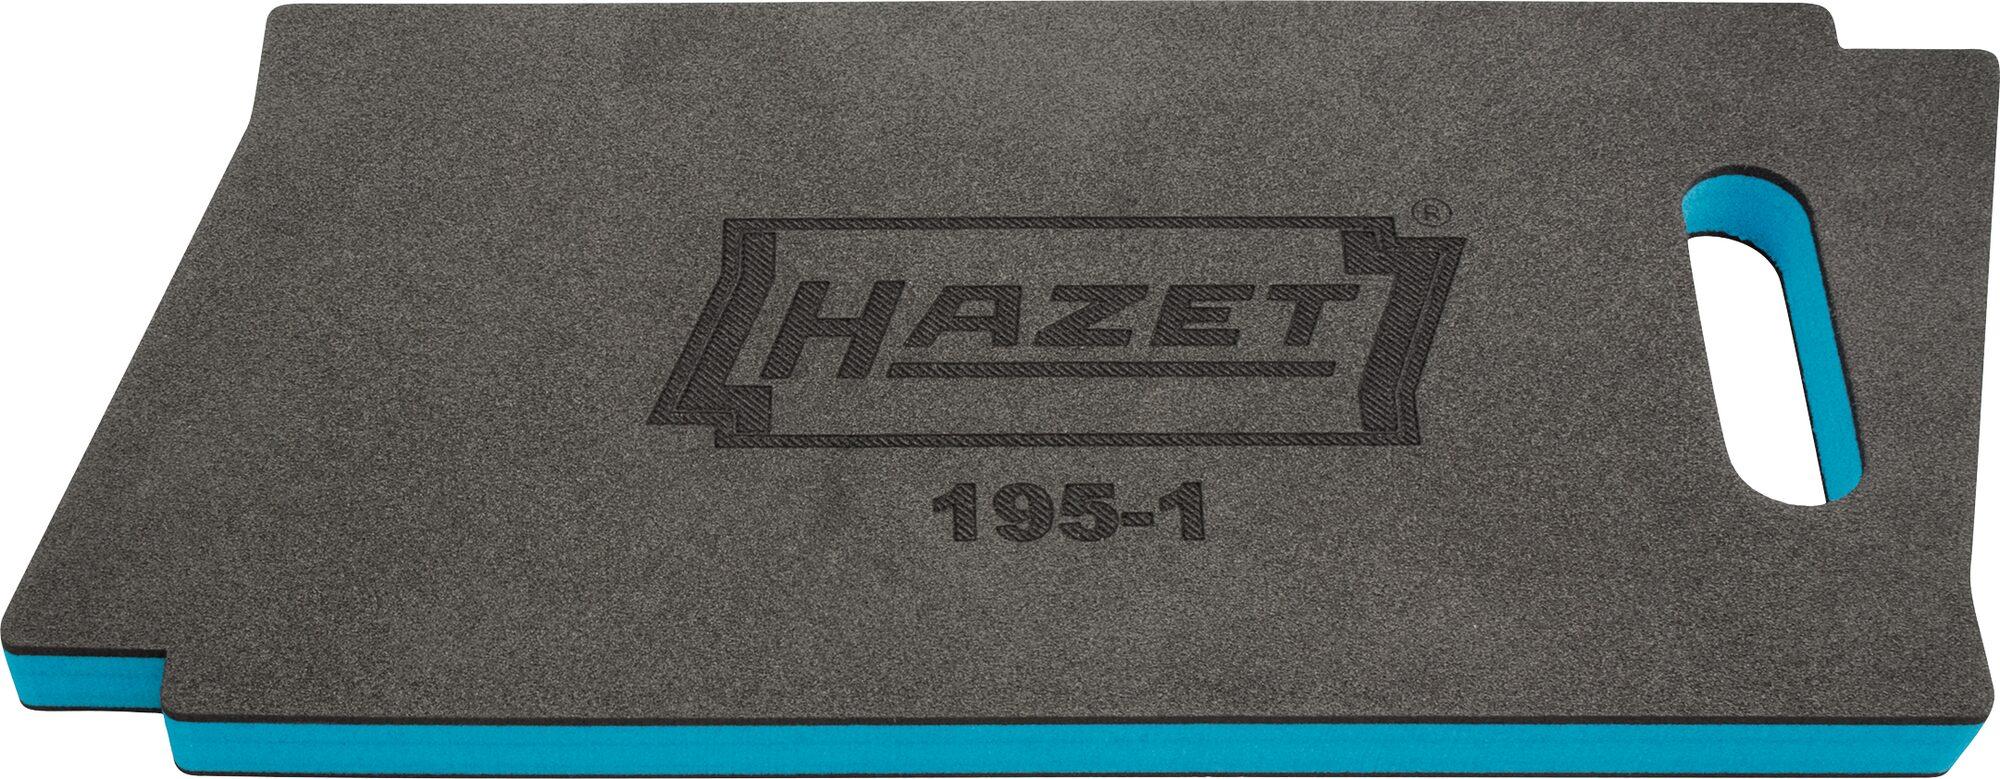 HAZET Kniebrett 195-1